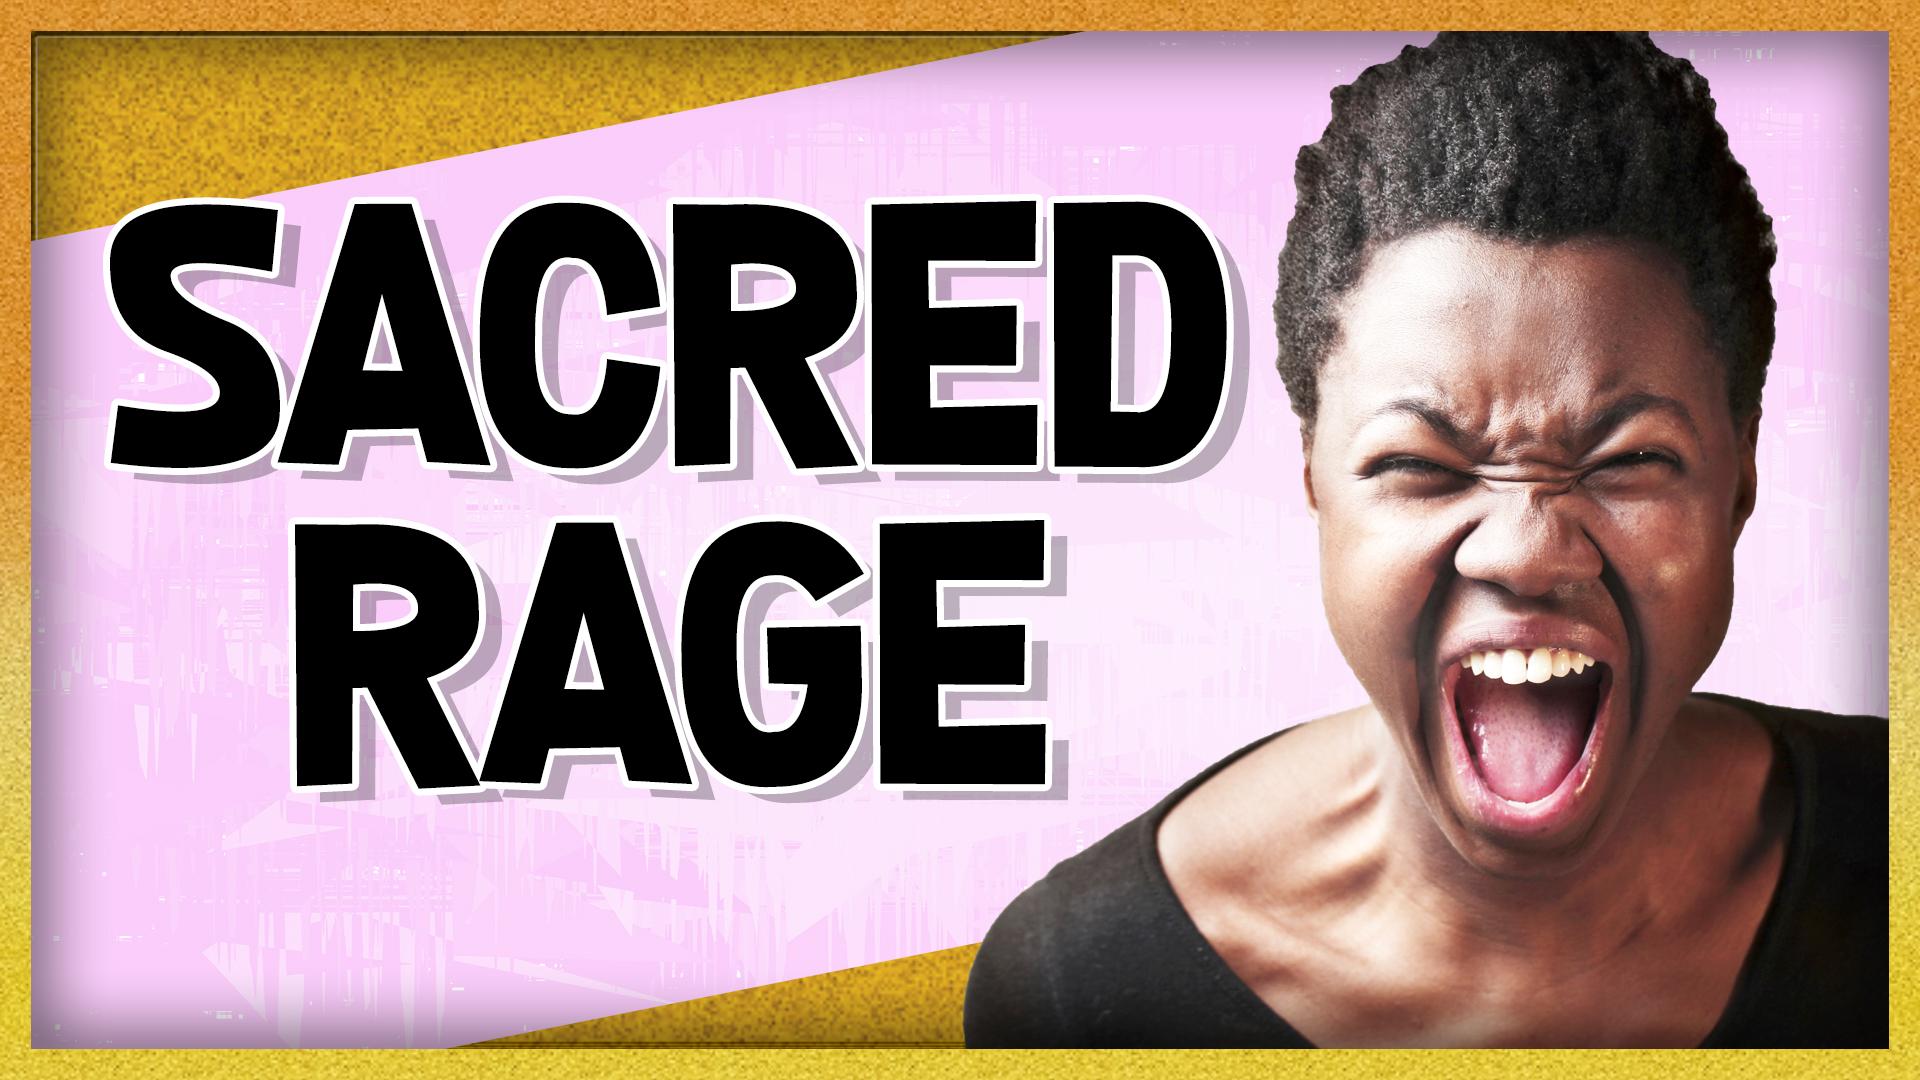 I Am Angry! Feeling Sacred Rage